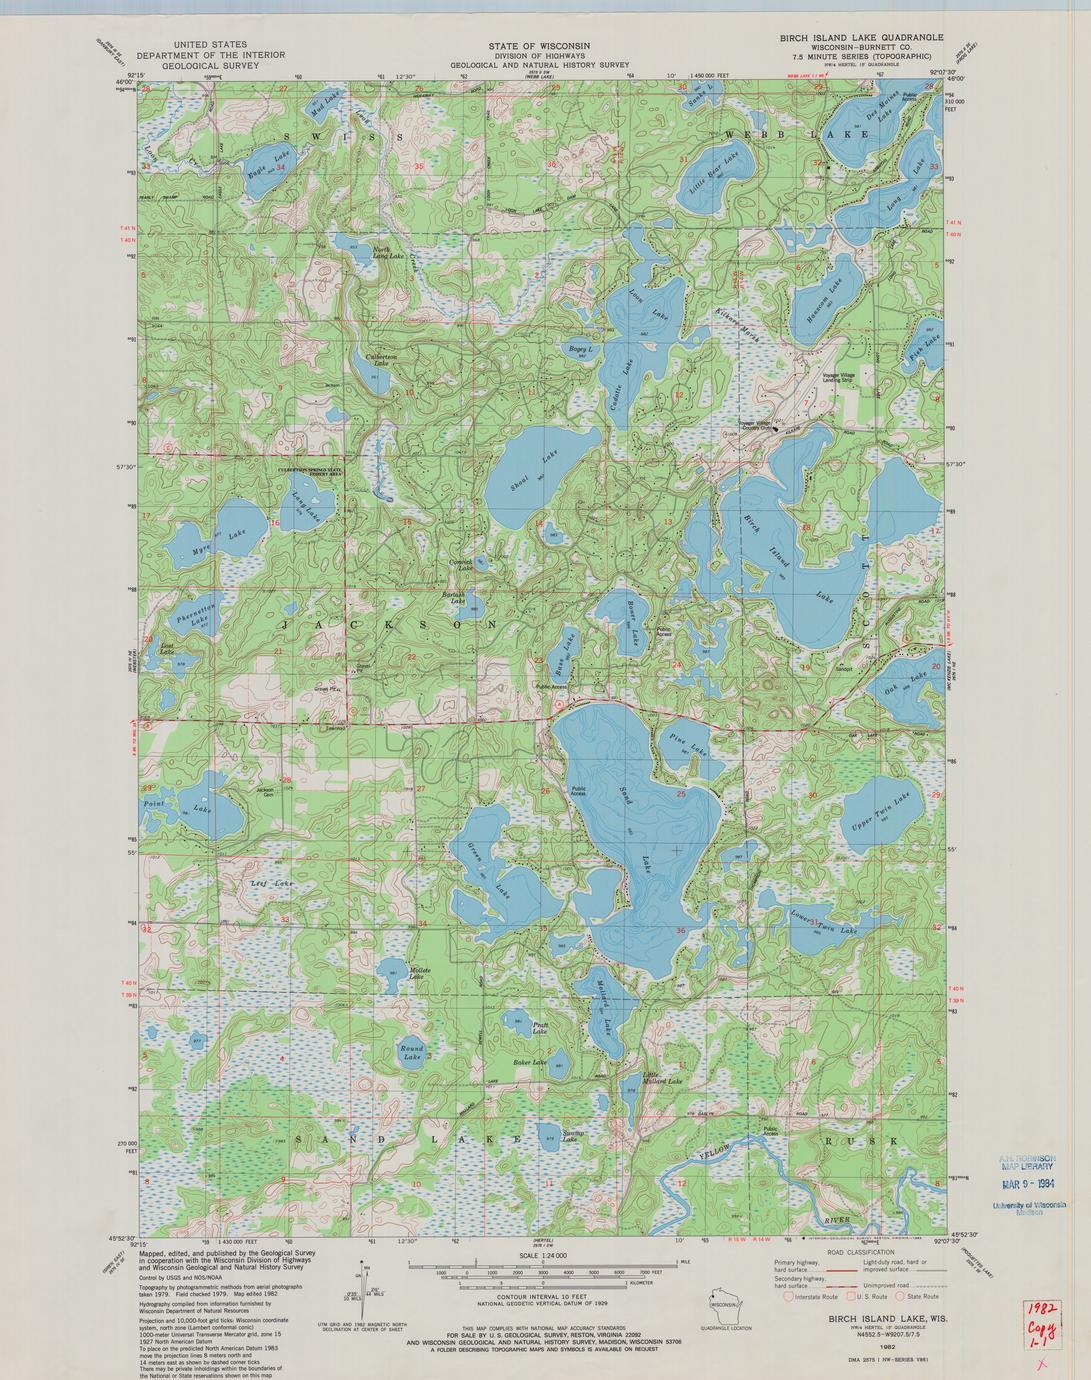 Birch Island Lake quadrangle